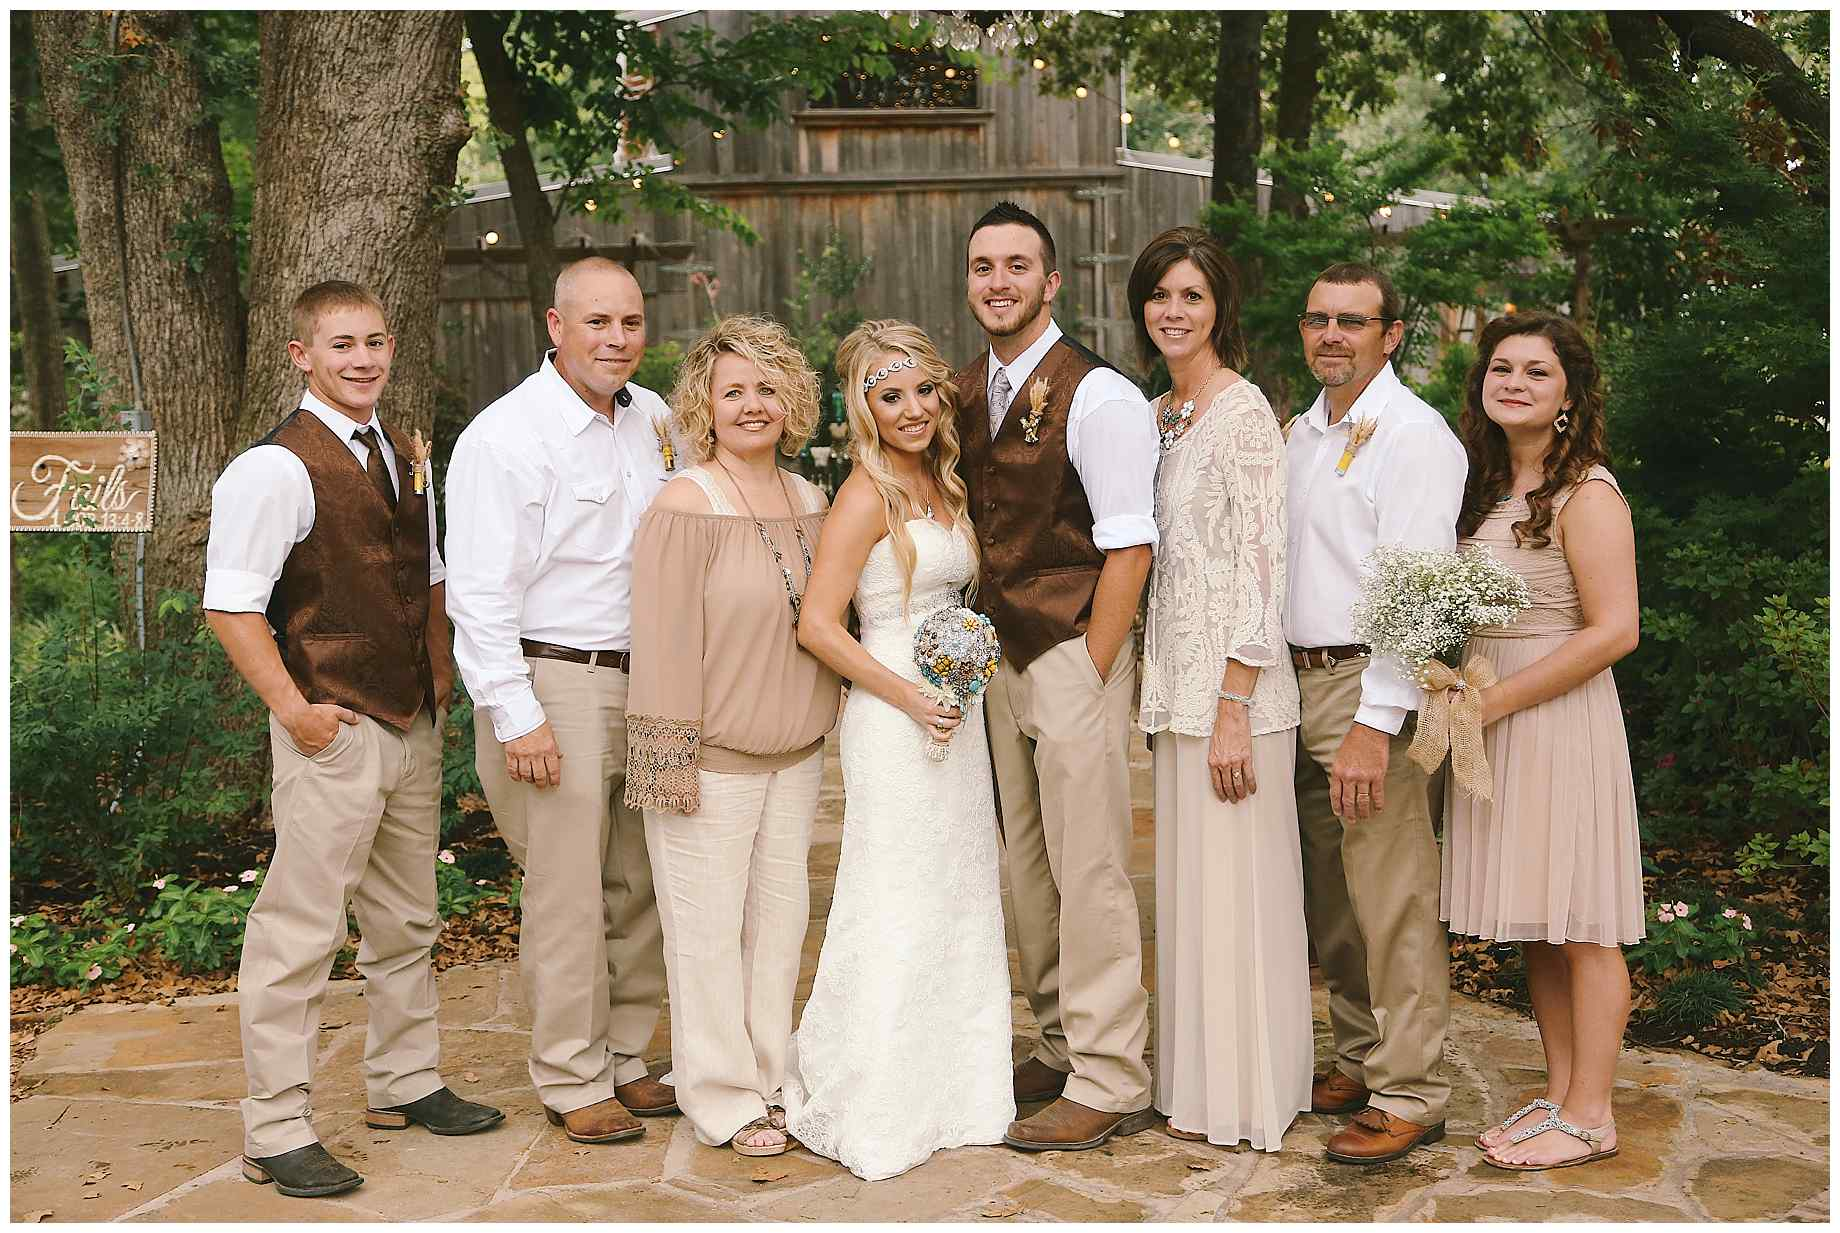 stone-oak-ranch-outdoor-wedding-013